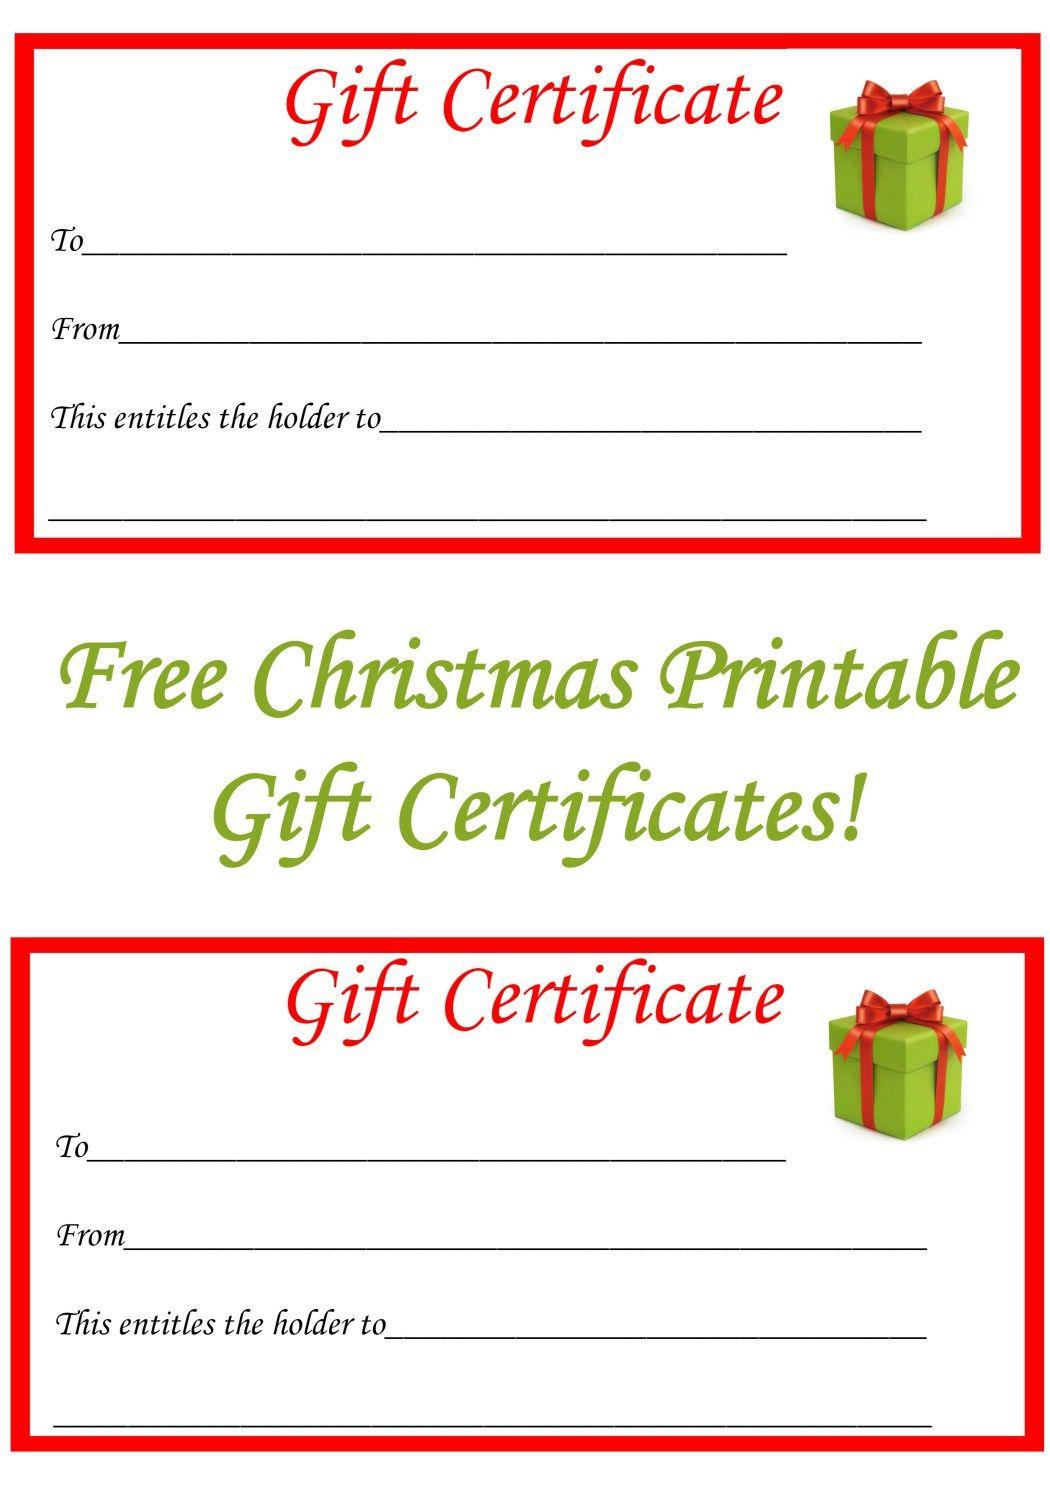 Free Christmas Printable Gift Certificates   Gift Ideas   Pinterest - Free Printable Gift Certificates